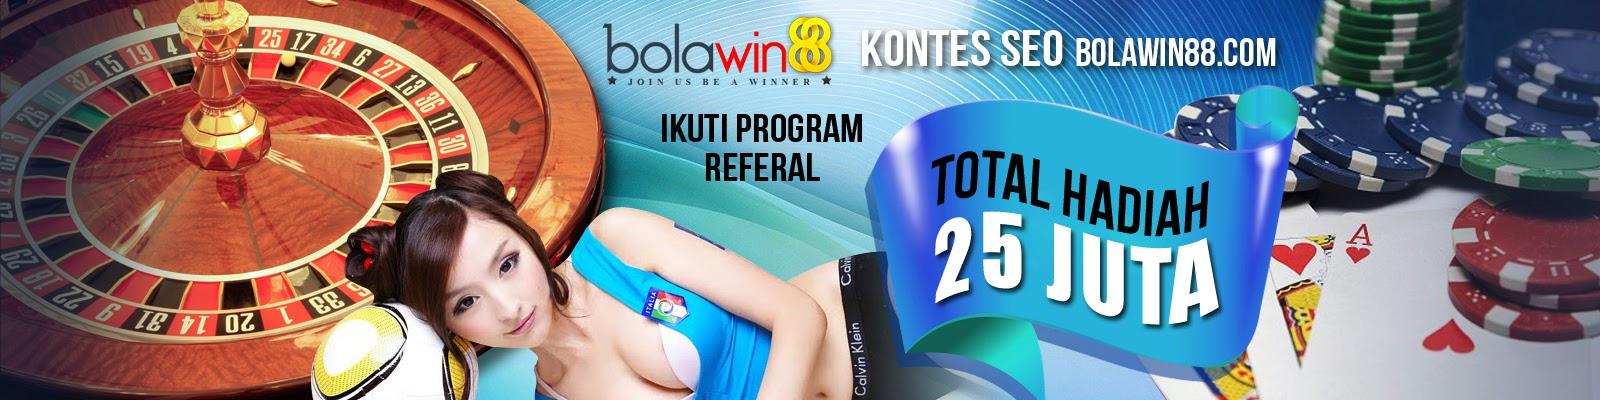 BOLAWIN88.COM BANDAR TARUHAN AGEN JUDI BOLA CASINO POKER DOMINO BOLATANGKAS DAN TOGEL ONLINE TERPERCAYA INDONESIA